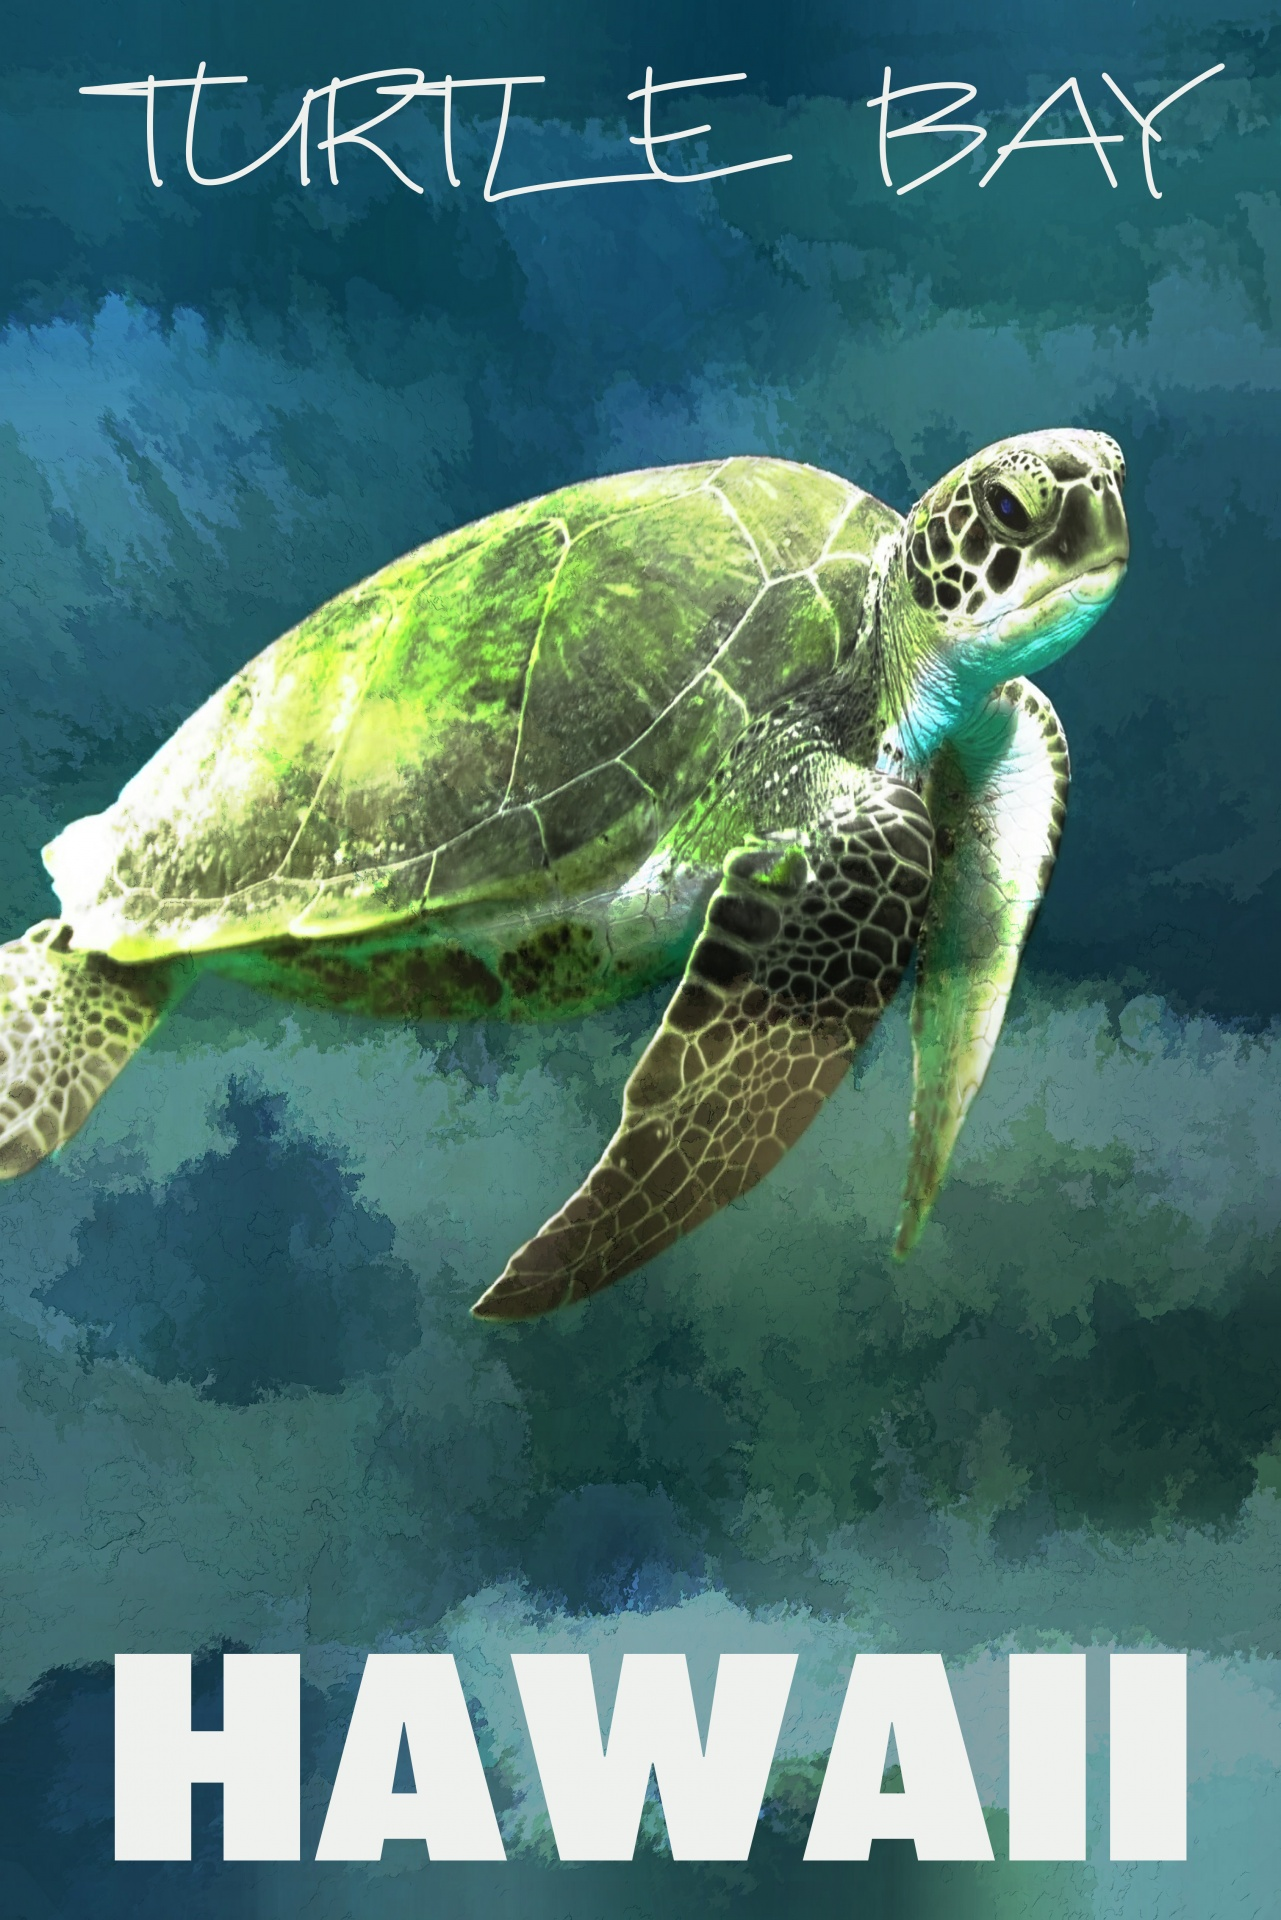 sea turtle artistic poster free stock